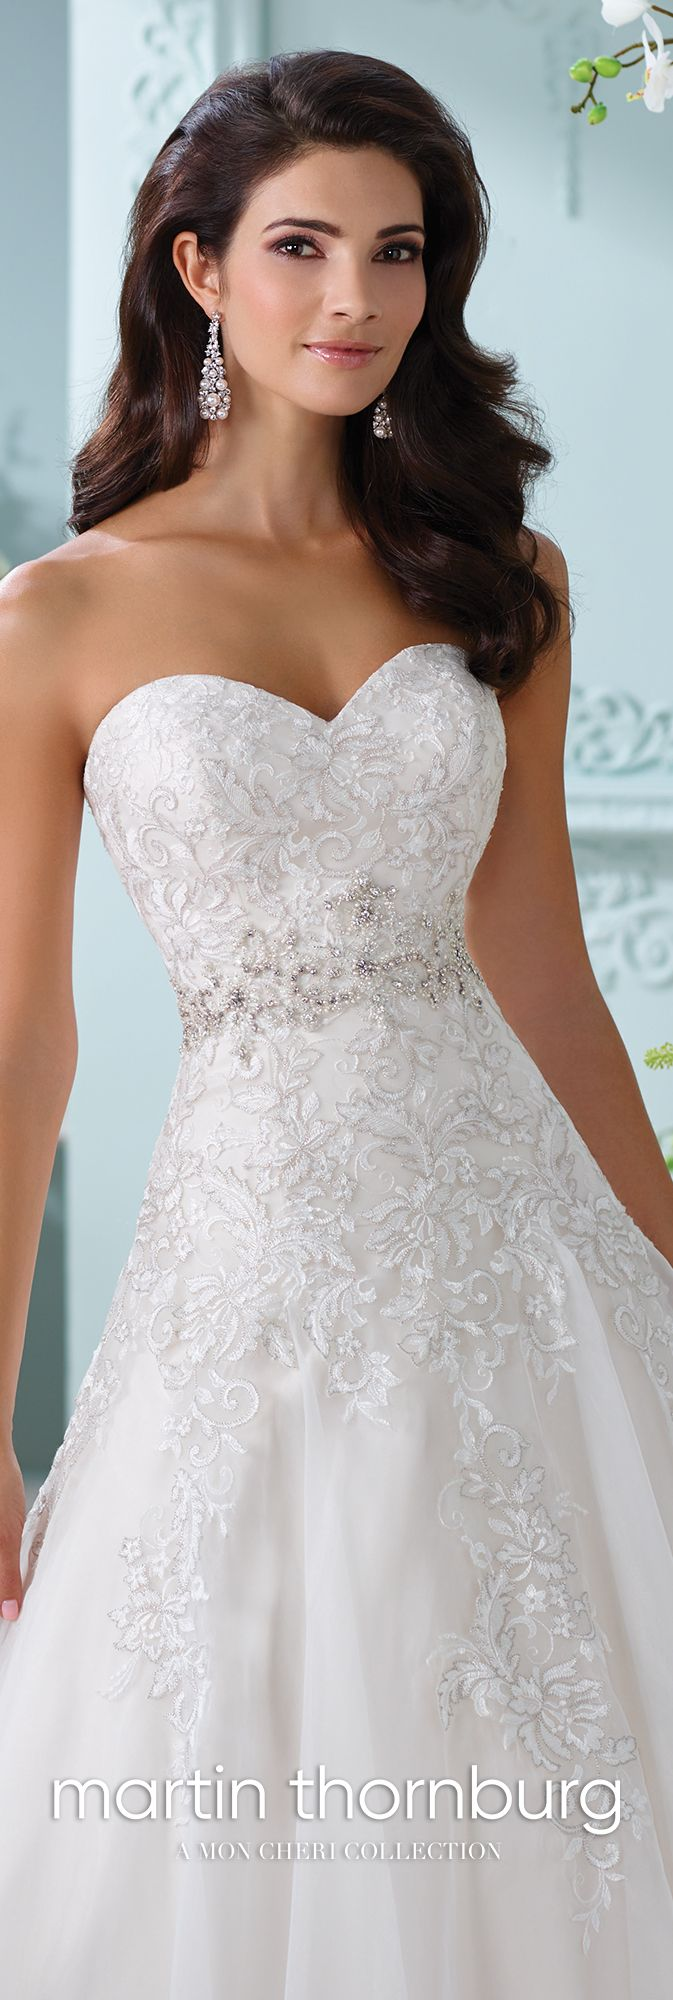 Strapless Sweetheart Neckline Lace A-Line Wedding Dress-116210 Laina ...